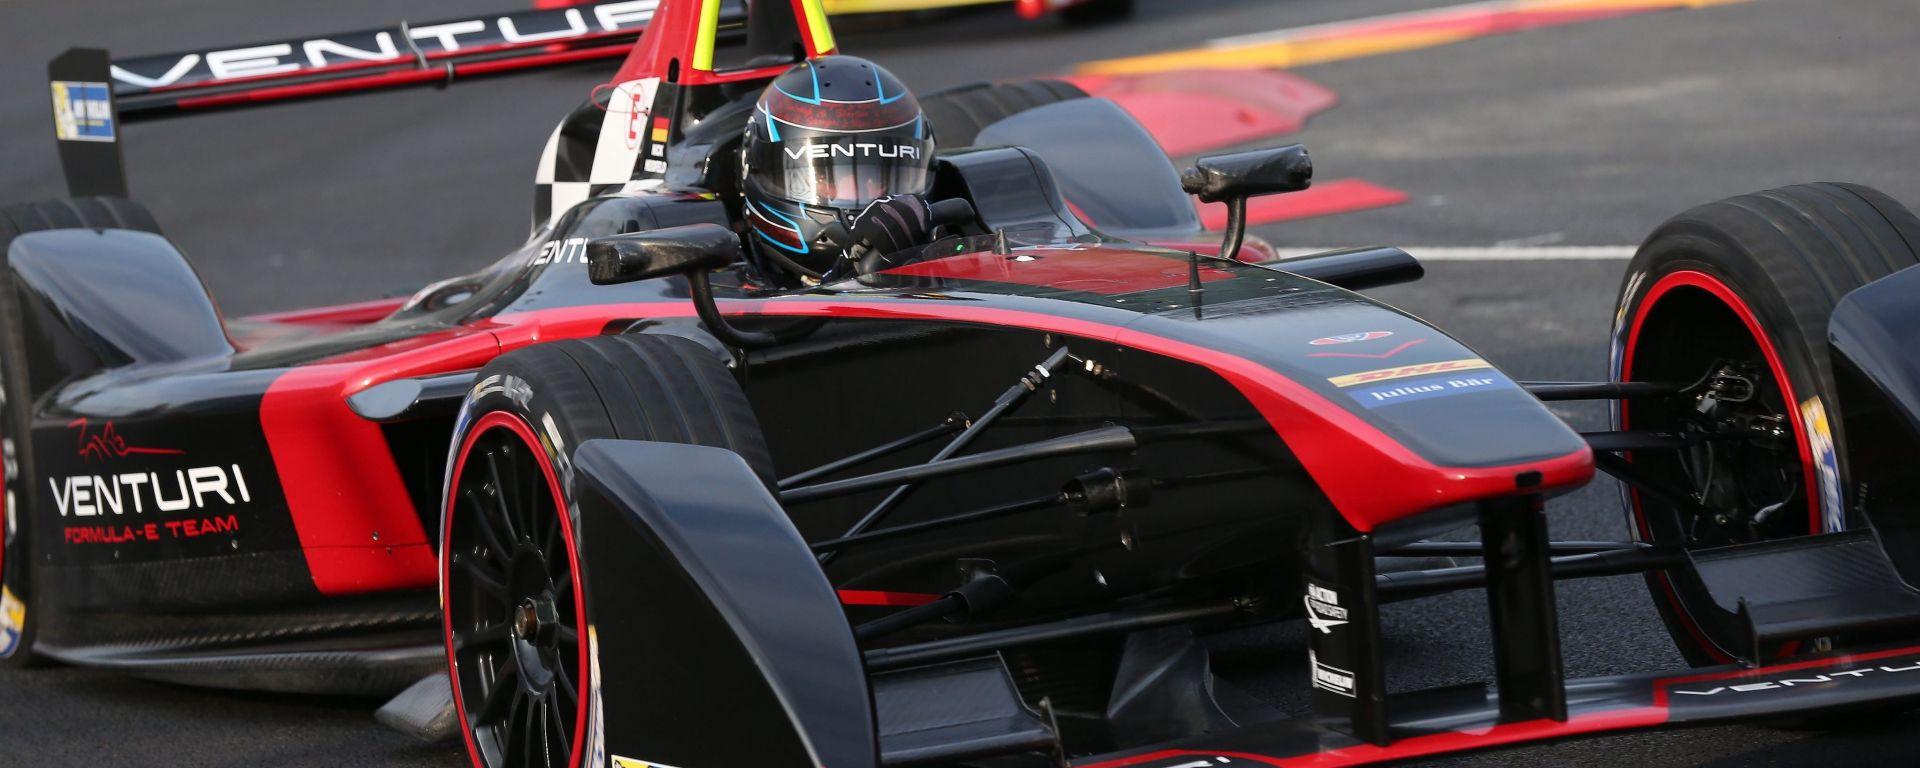 Venturi Grand Prix - Formula e